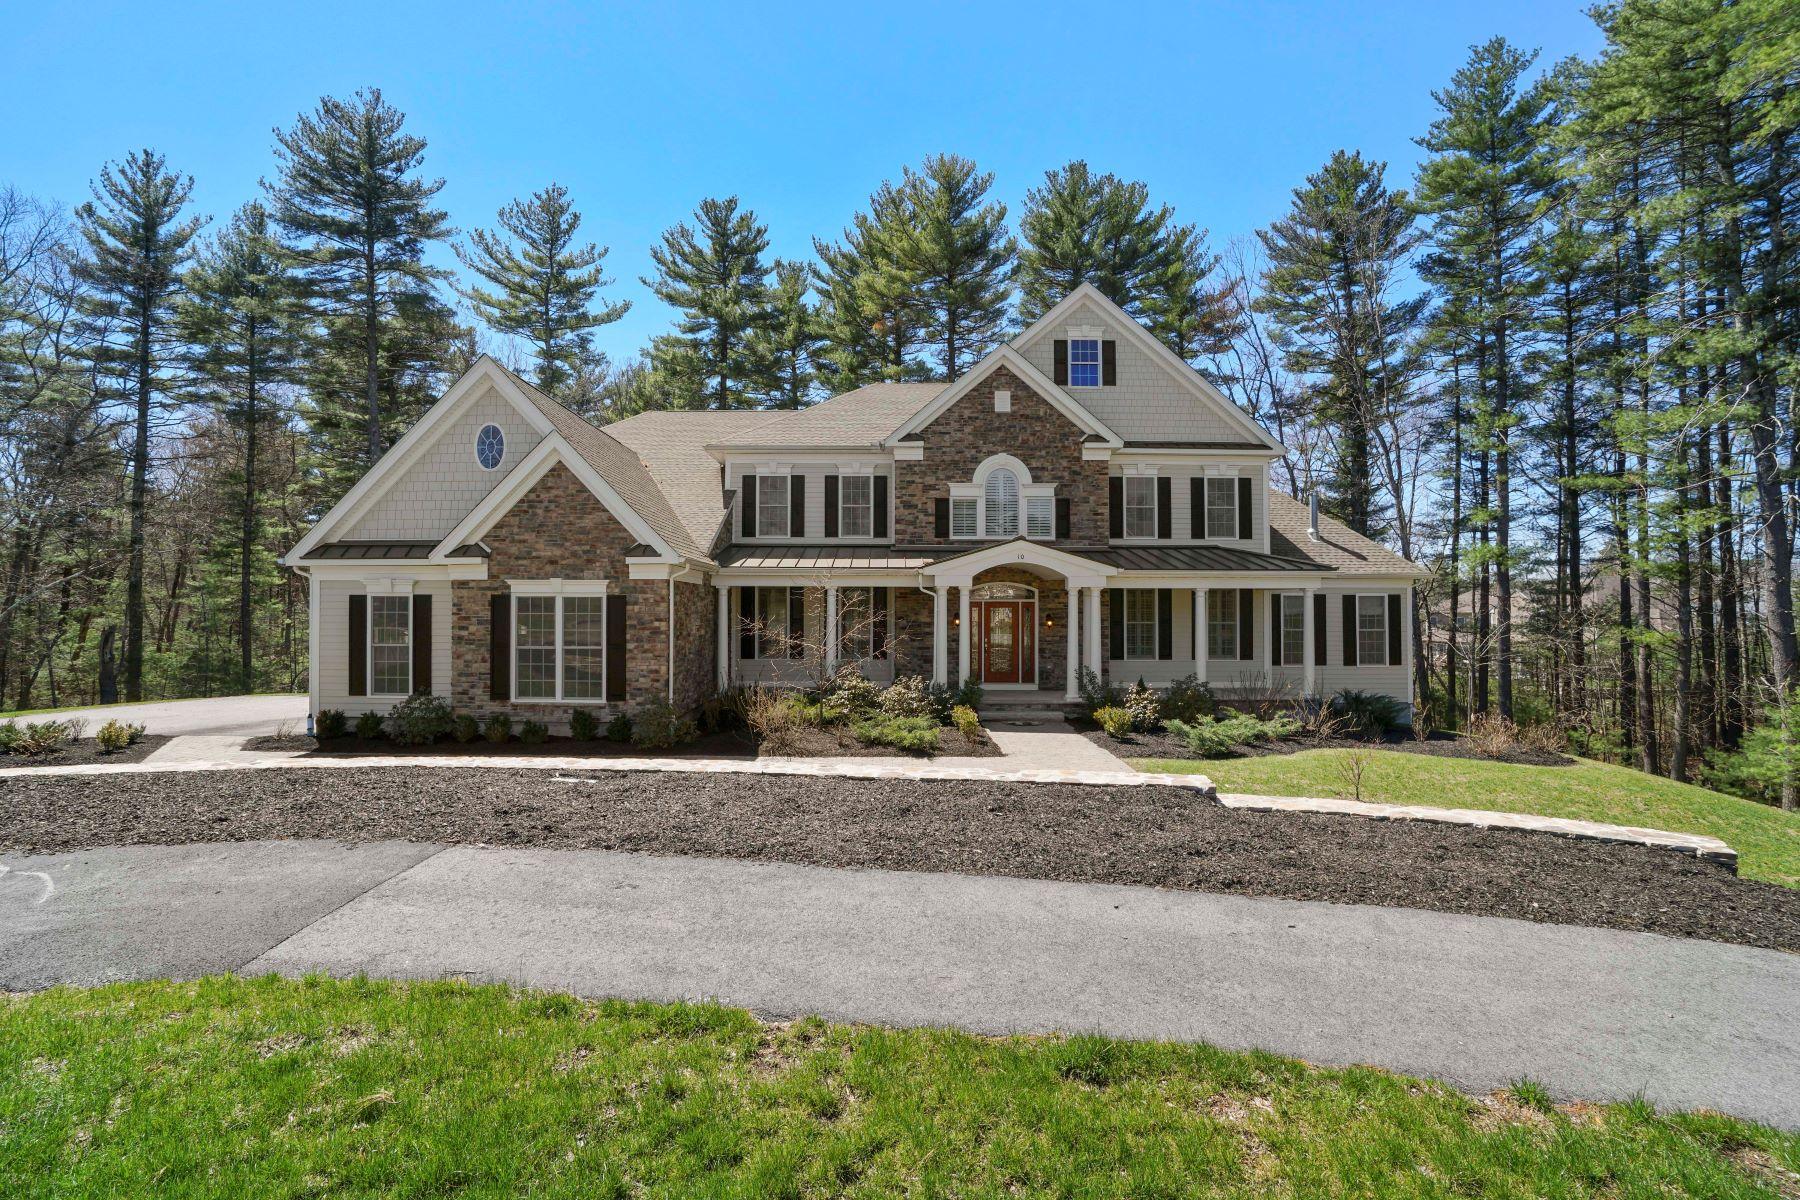 Single Family Home for Active at 10 Shady Lane Walpole, Massachusetts 02081 United States